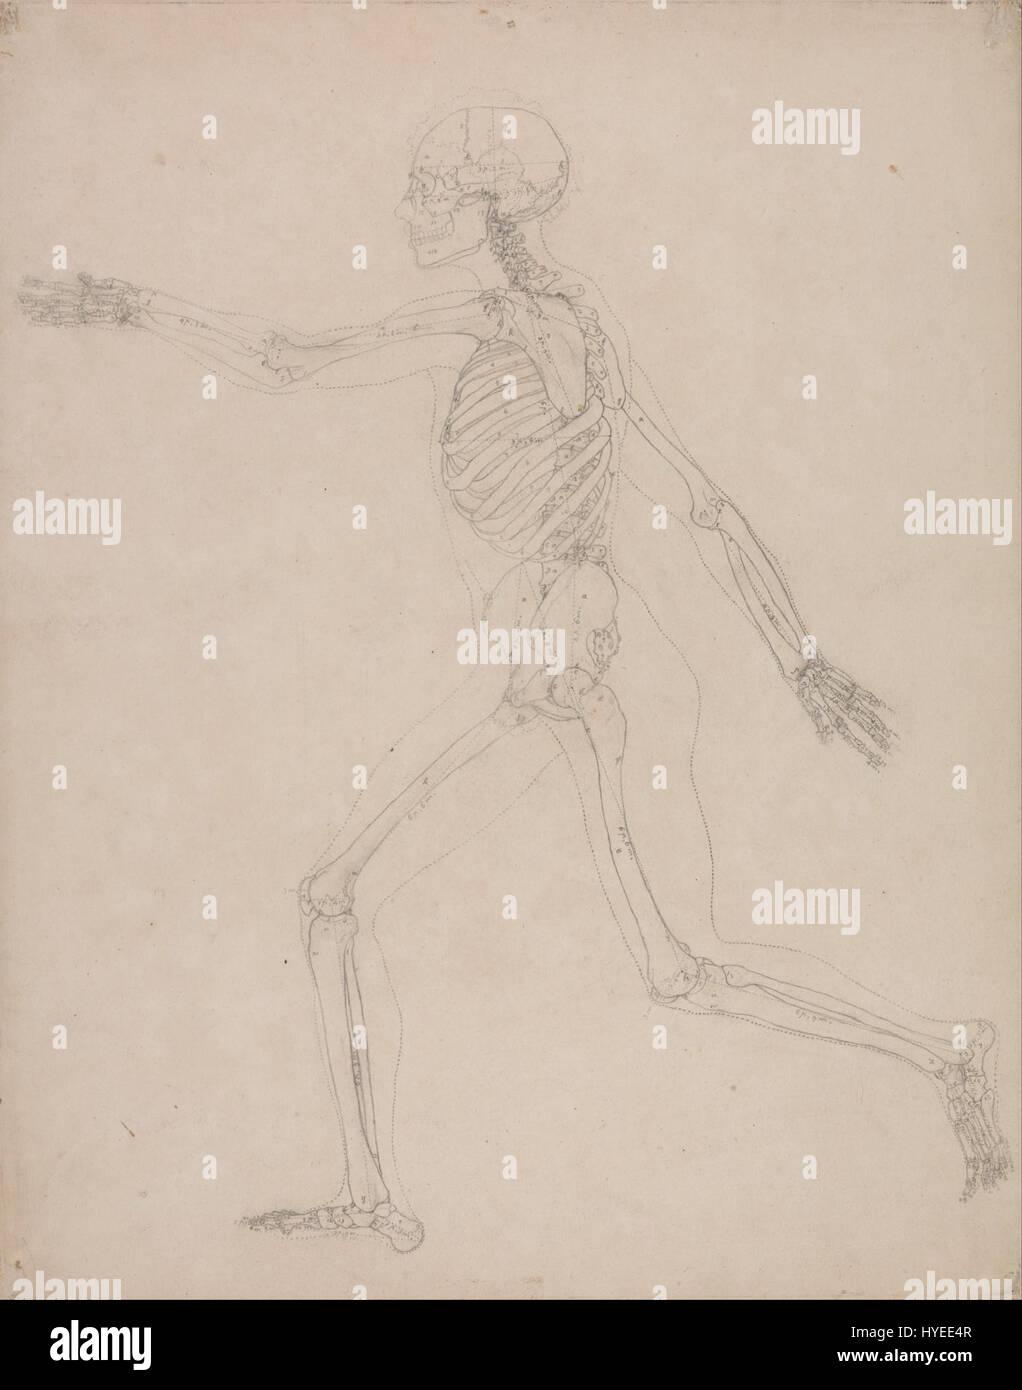 Anatomical Painting Stockfotos & Anatomical Painting Bilder - Seite ...